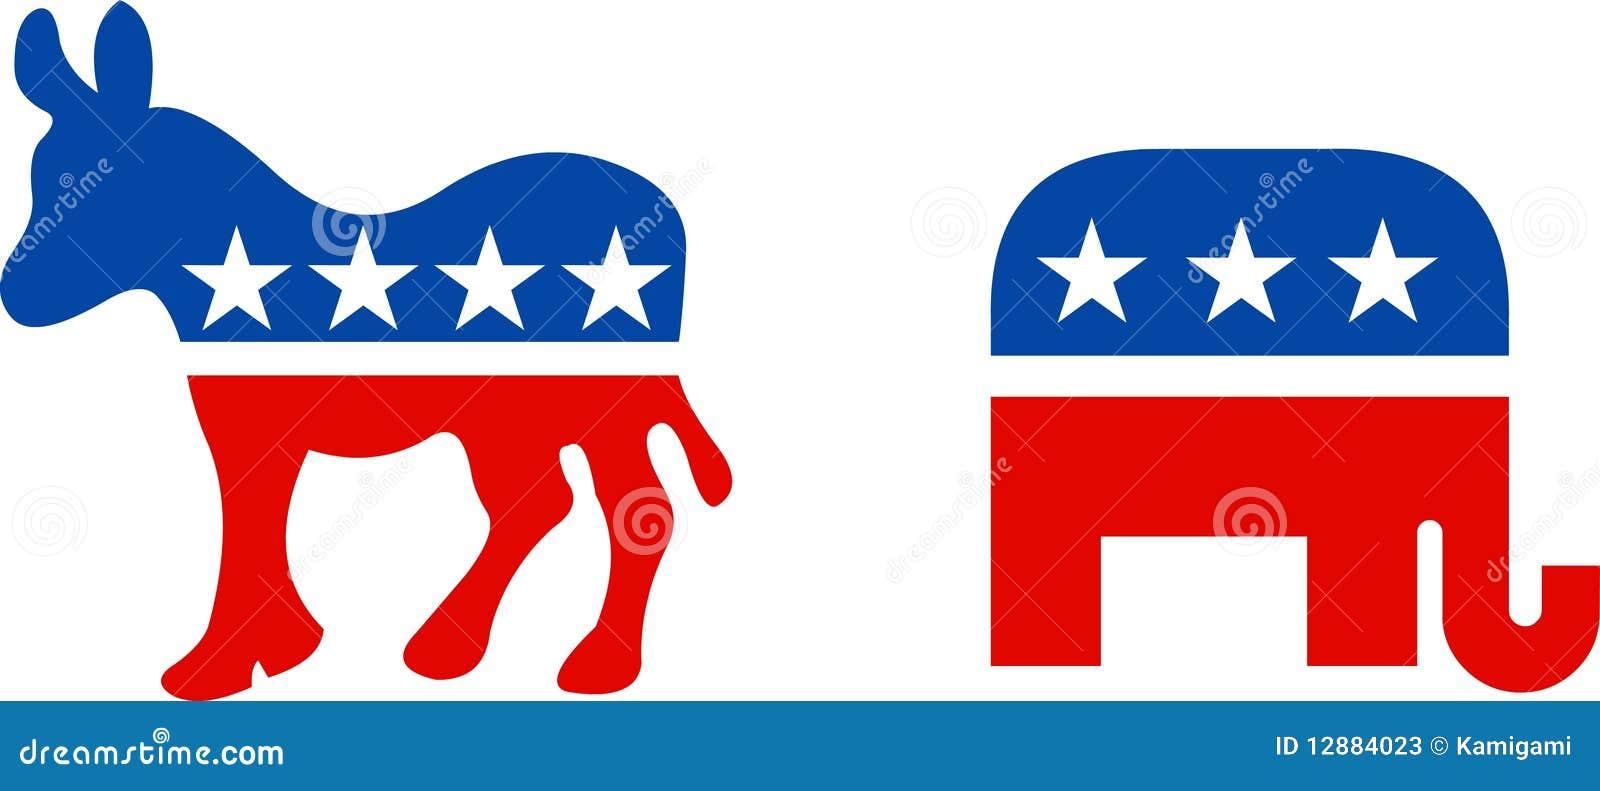 Usa Political Symbols Editorial Stock Photo Illustration Of Blue